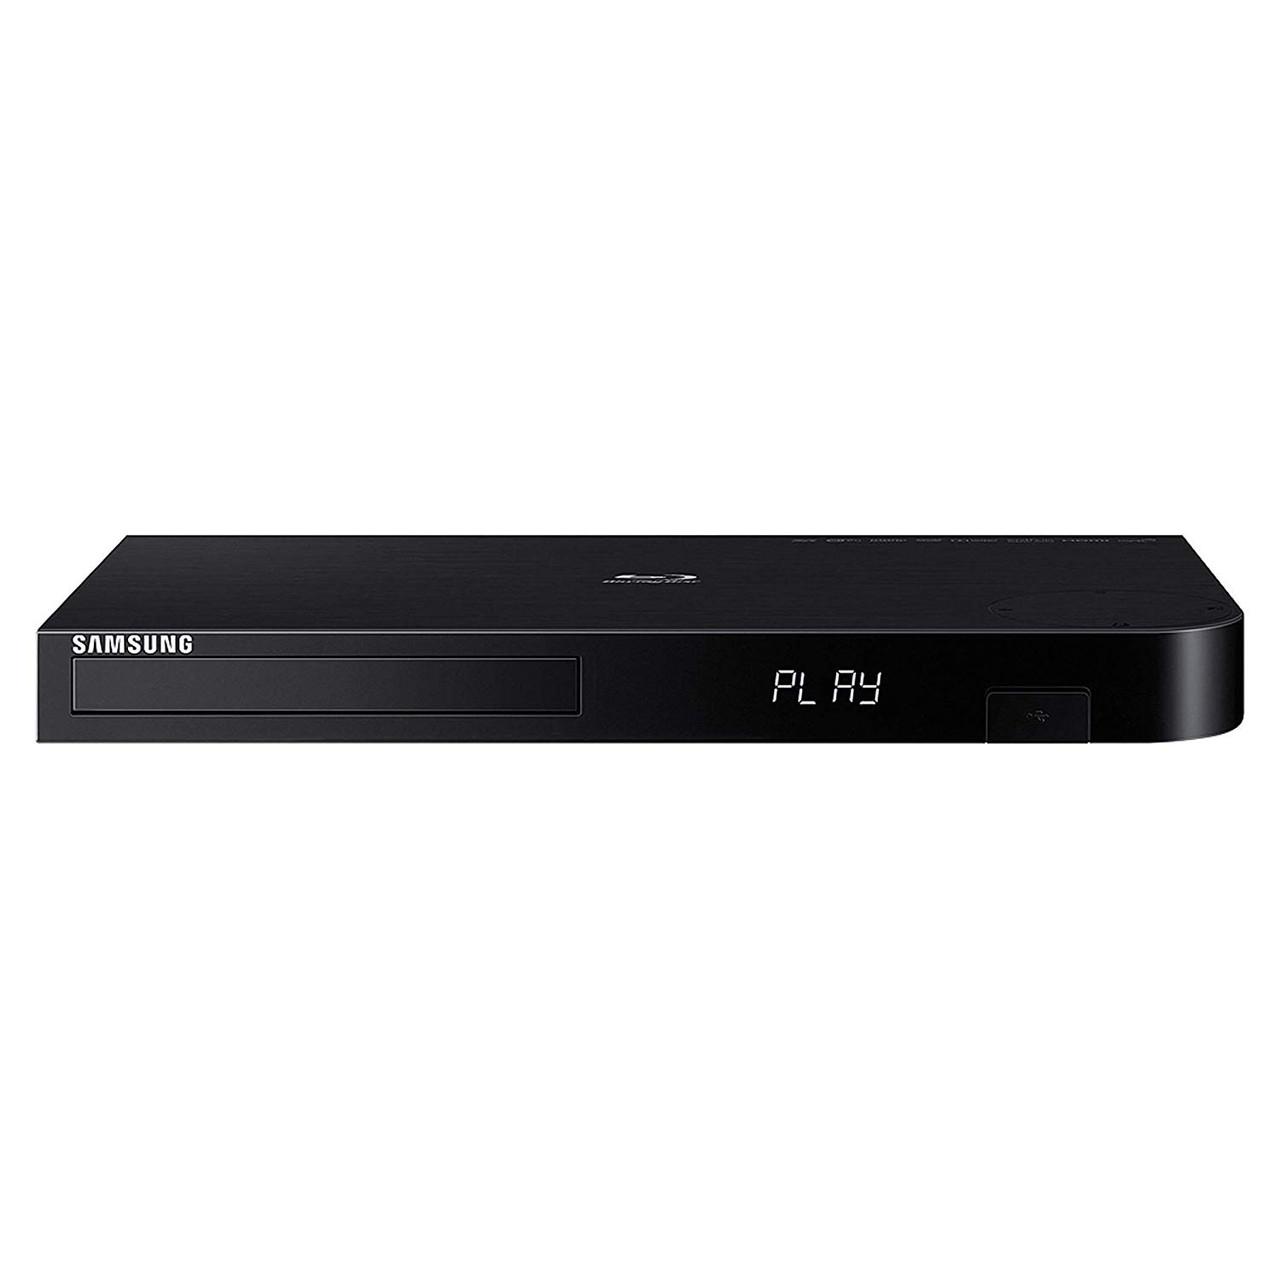 Samsung BD-JM63/ZAR 3D Blu-ray Player with WiFi – Certified Refurbished